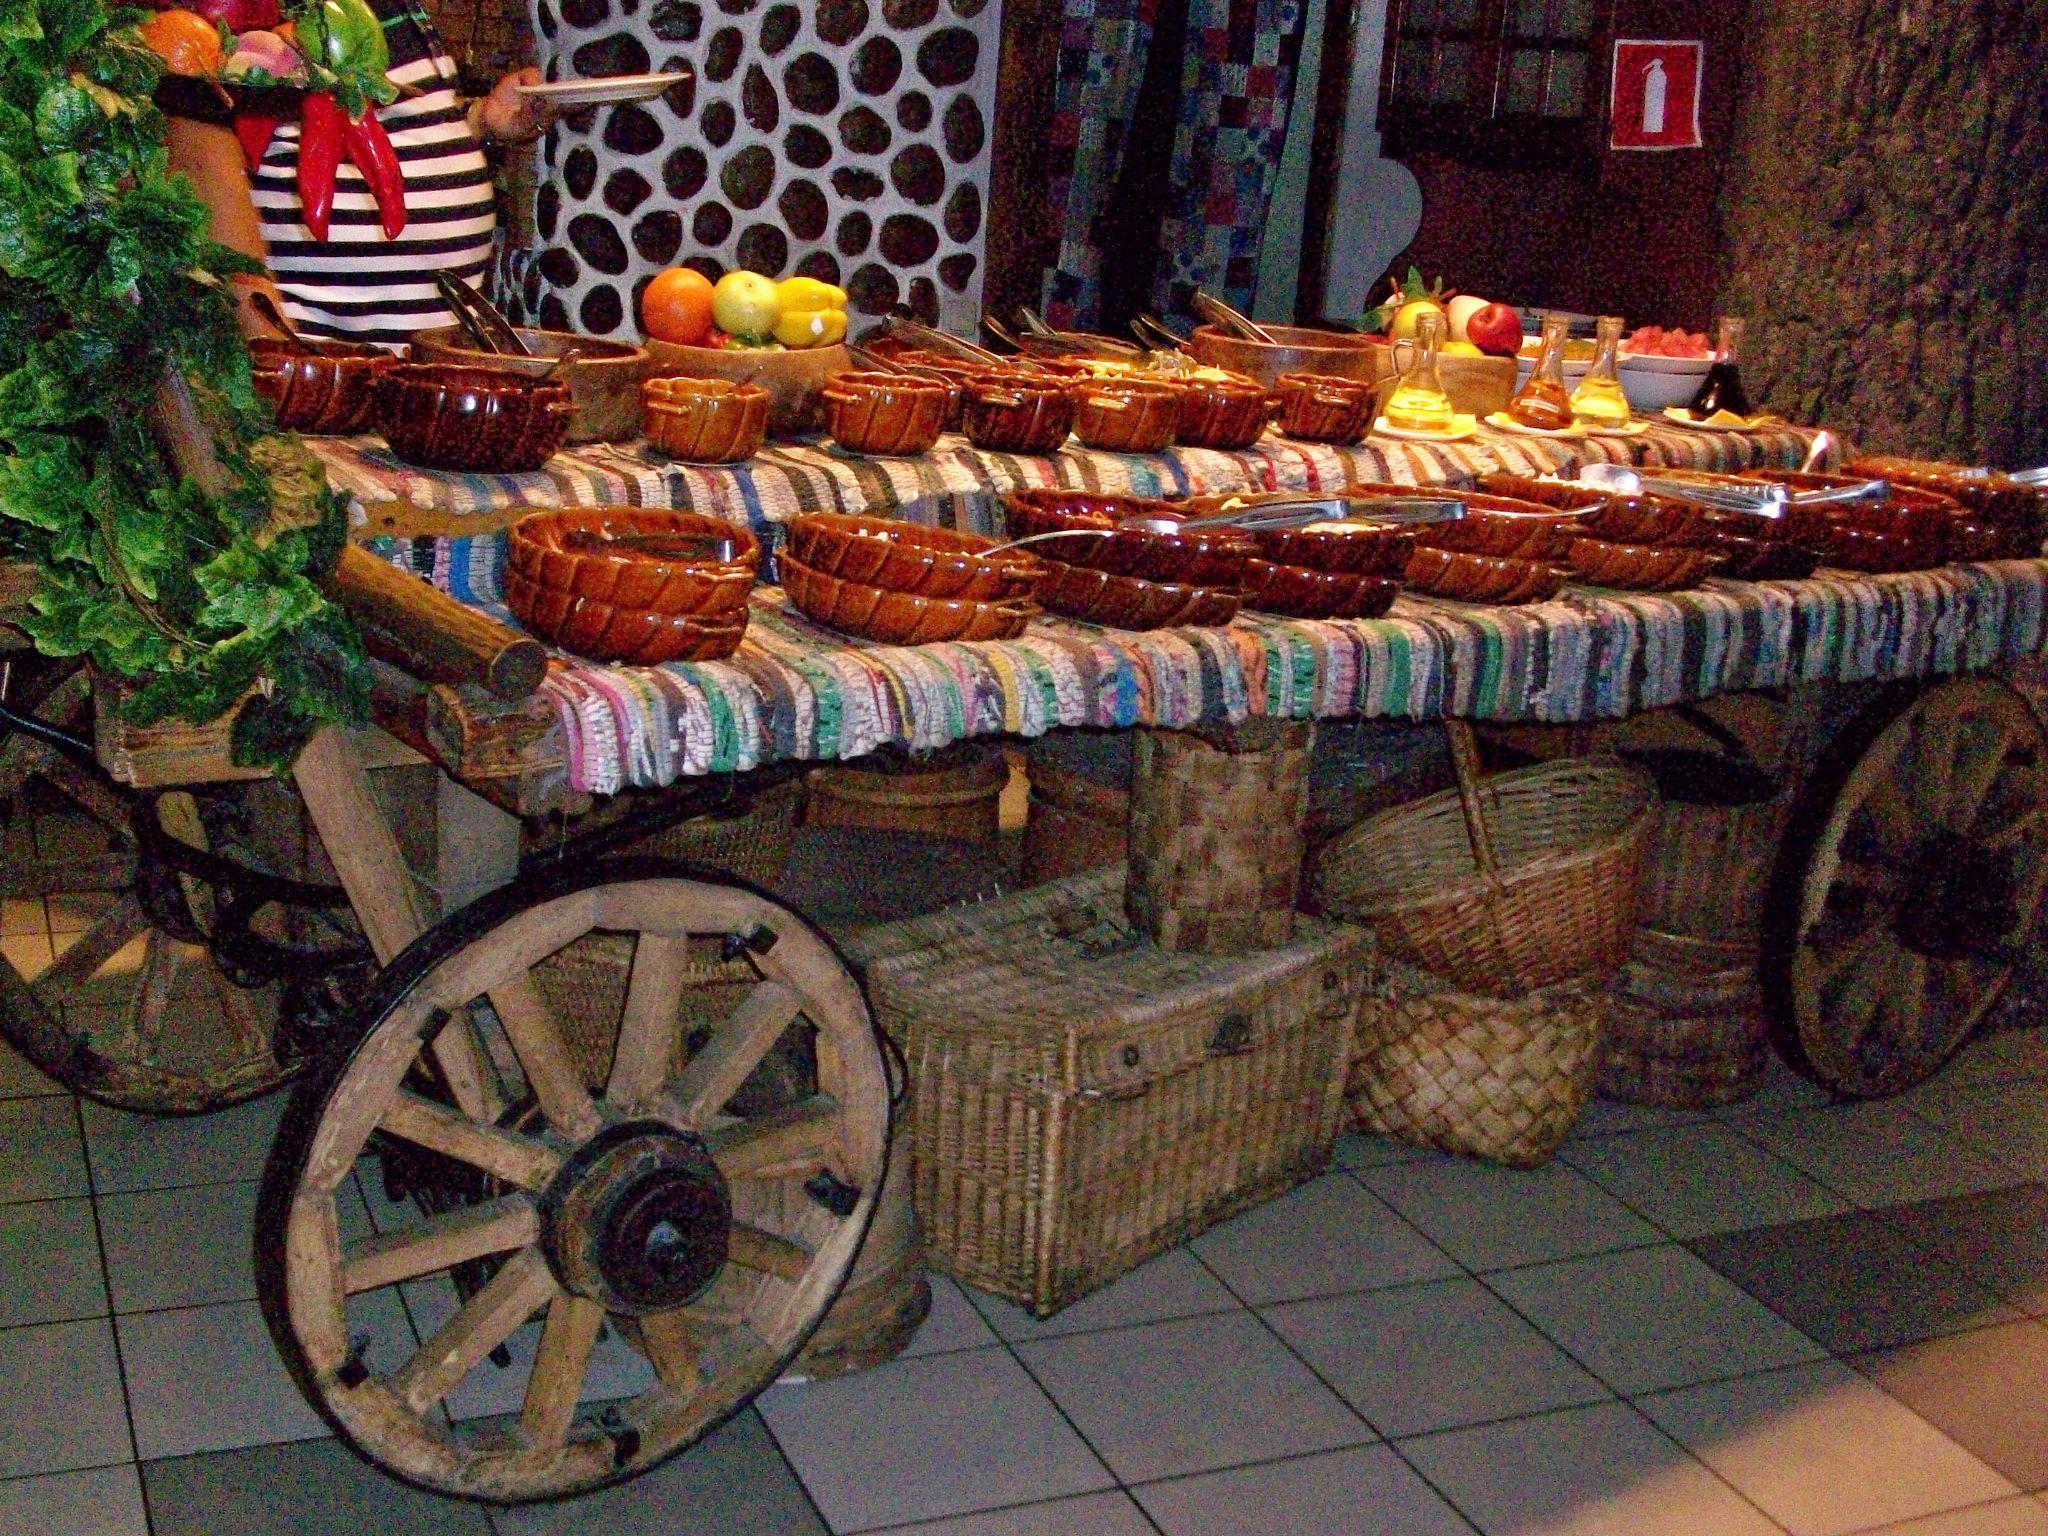 Table at the restaurant Yolki-Palki (or Elki Palki) by NatalyaParris